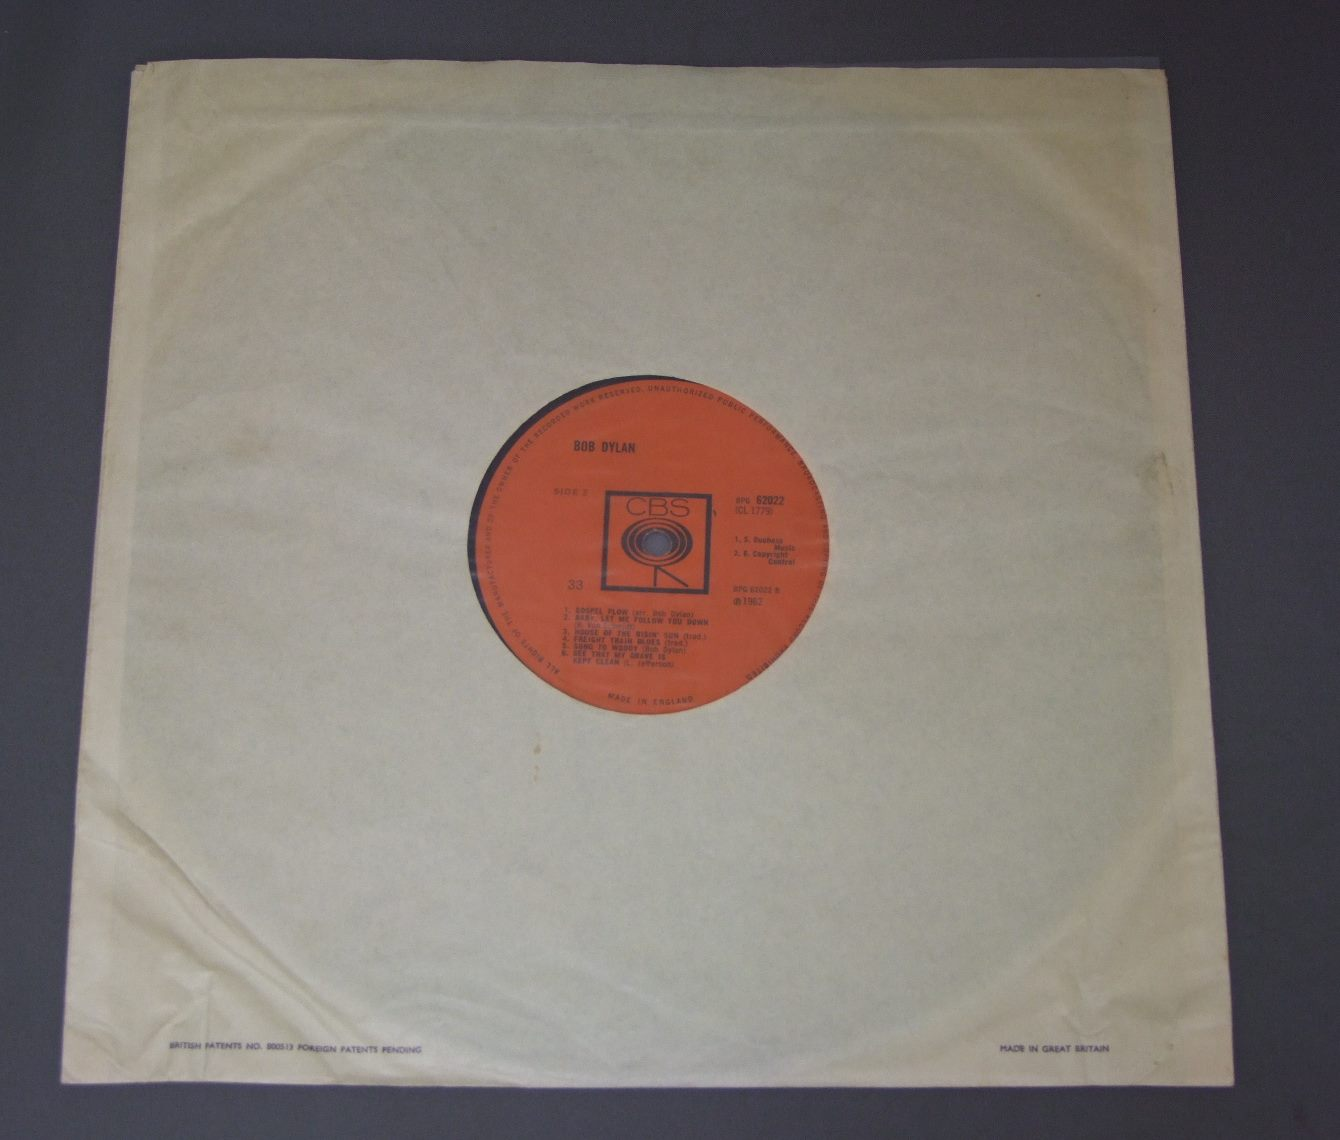 BOB DYLAN 1st ALBUM